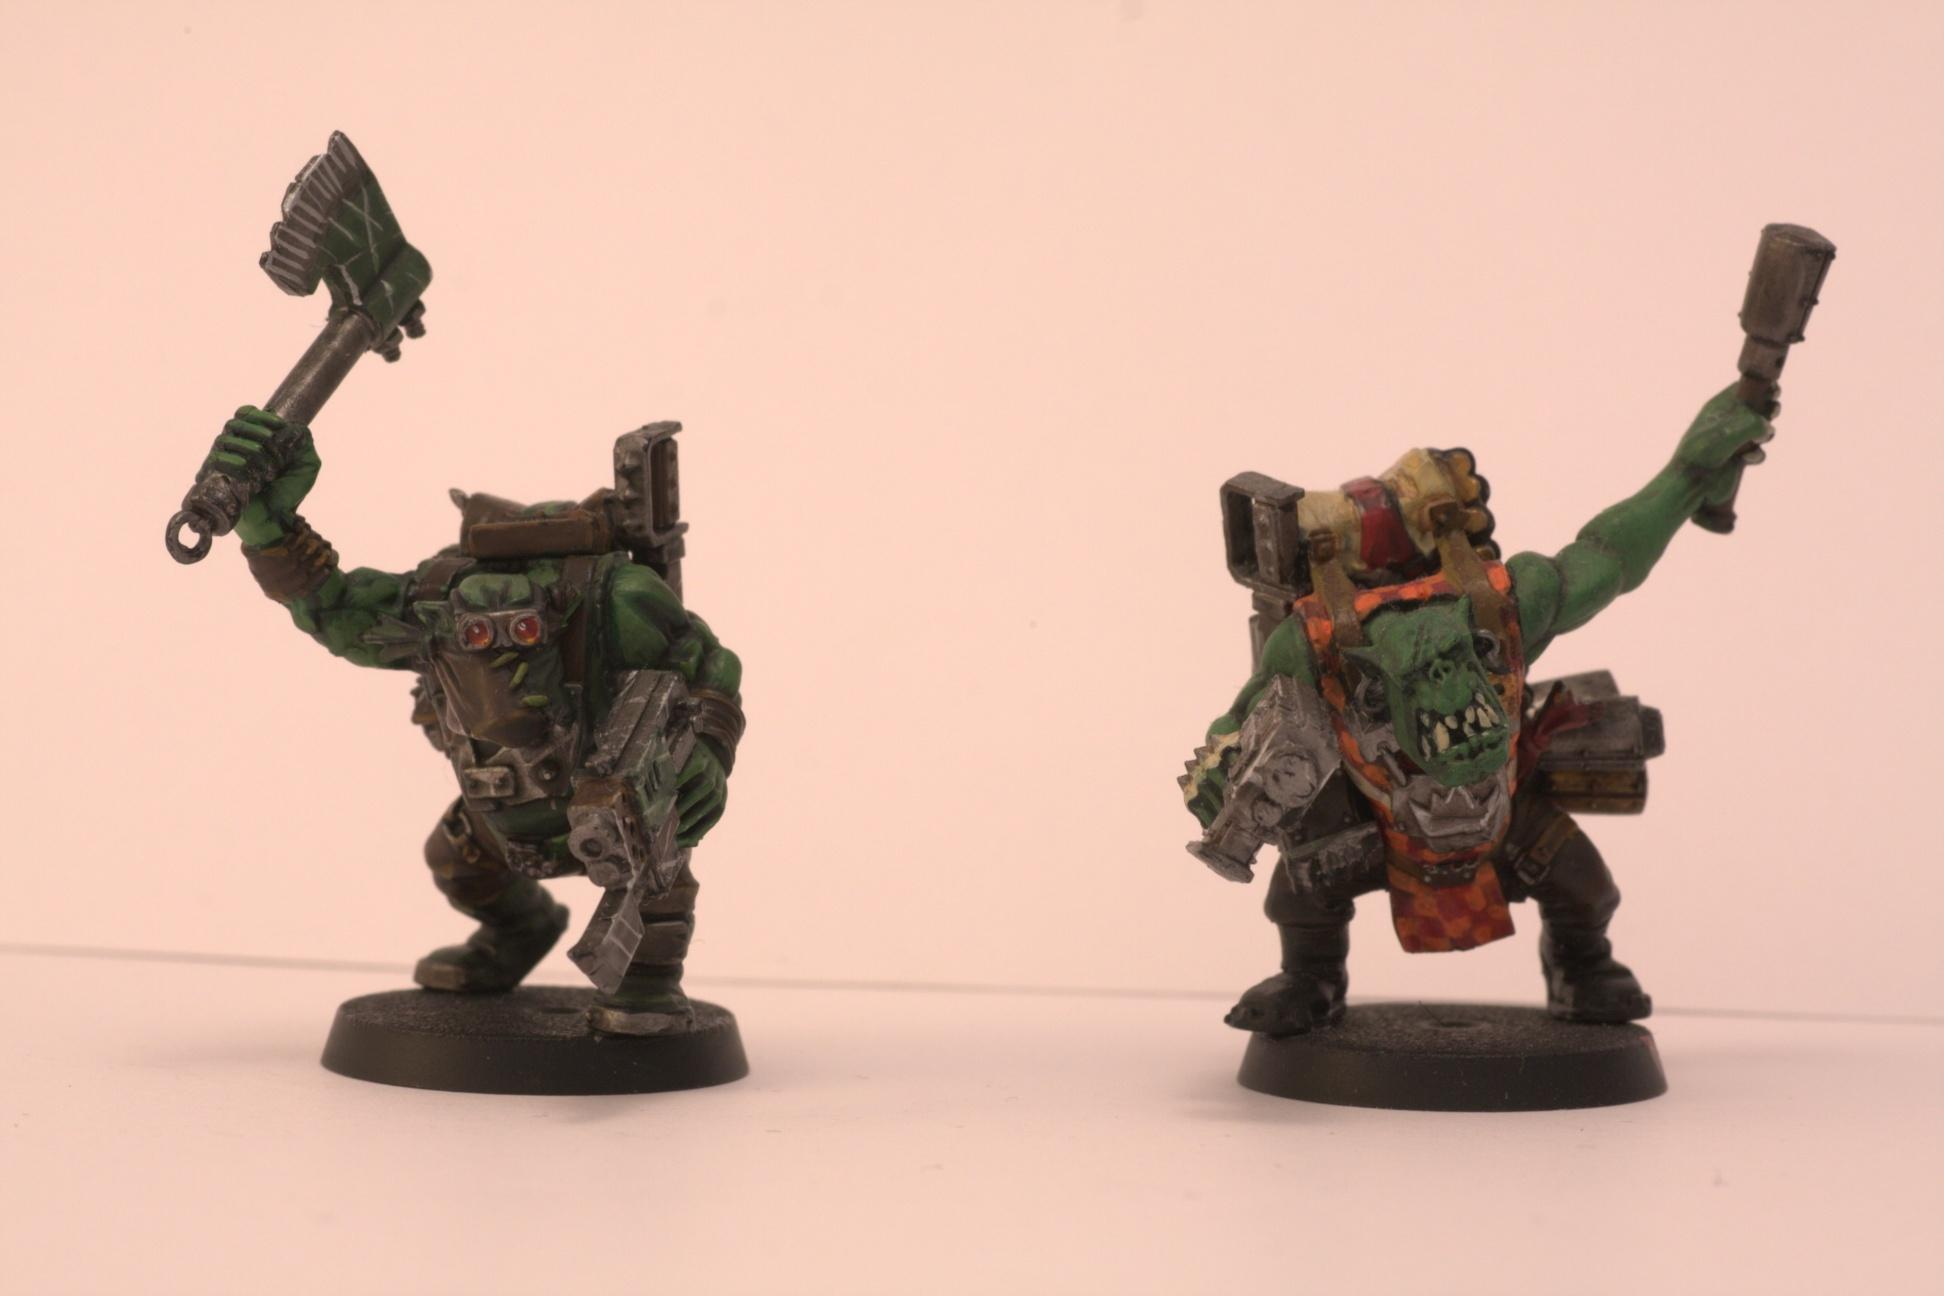 Kamoflage, Kommandoz, Orks, Snakebite, Warhammer 40,000